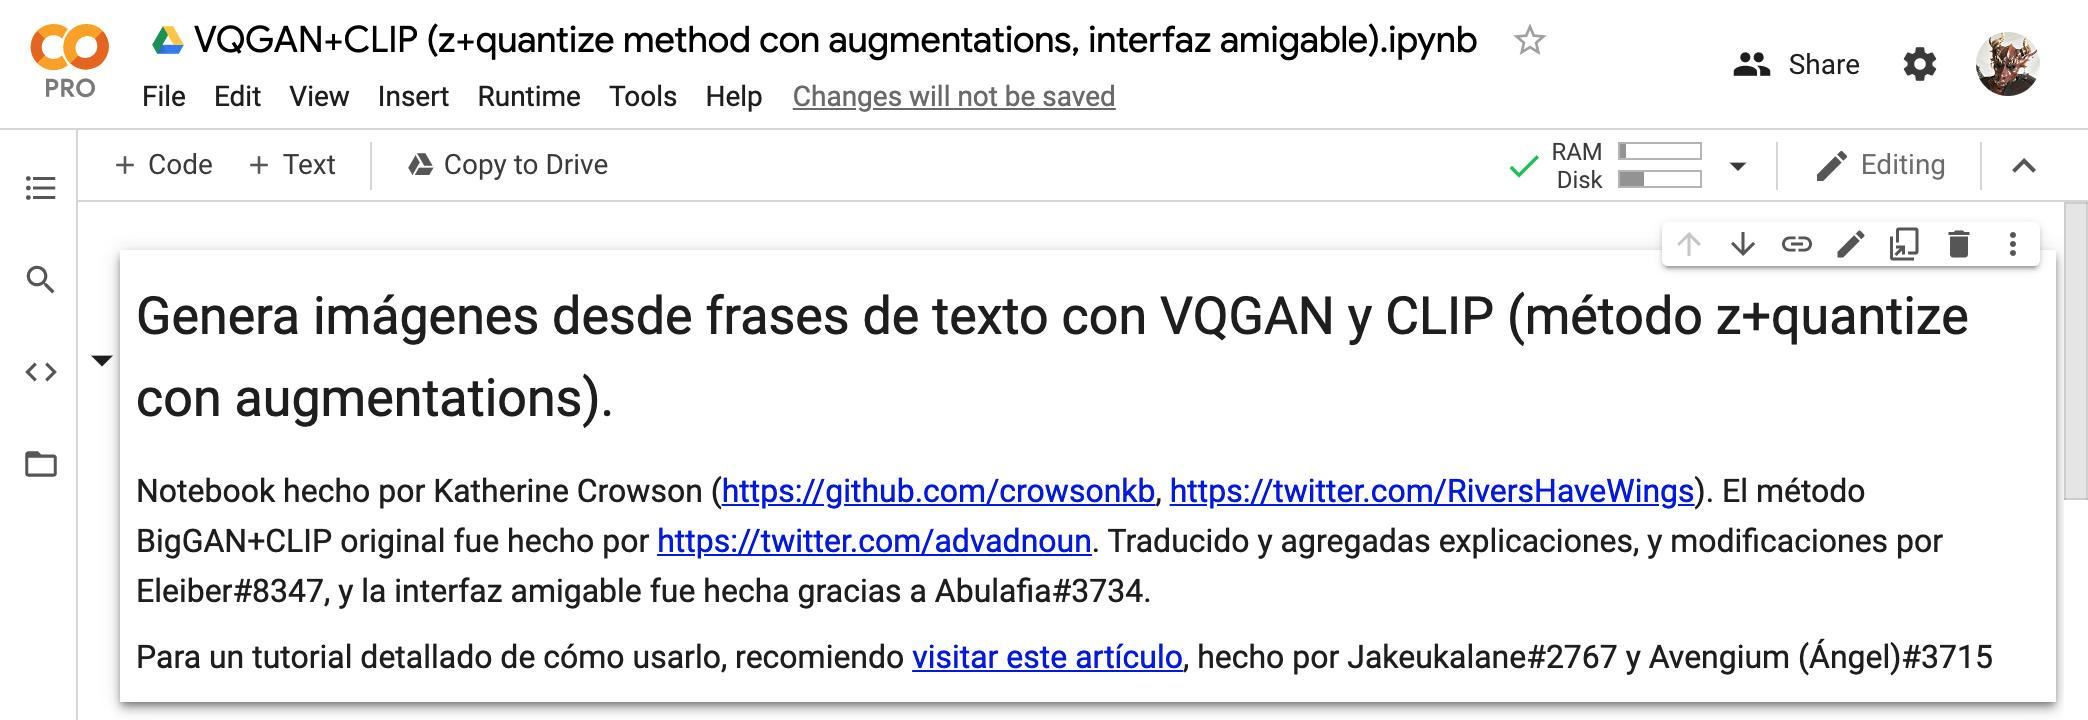 python_startup-spanish.png